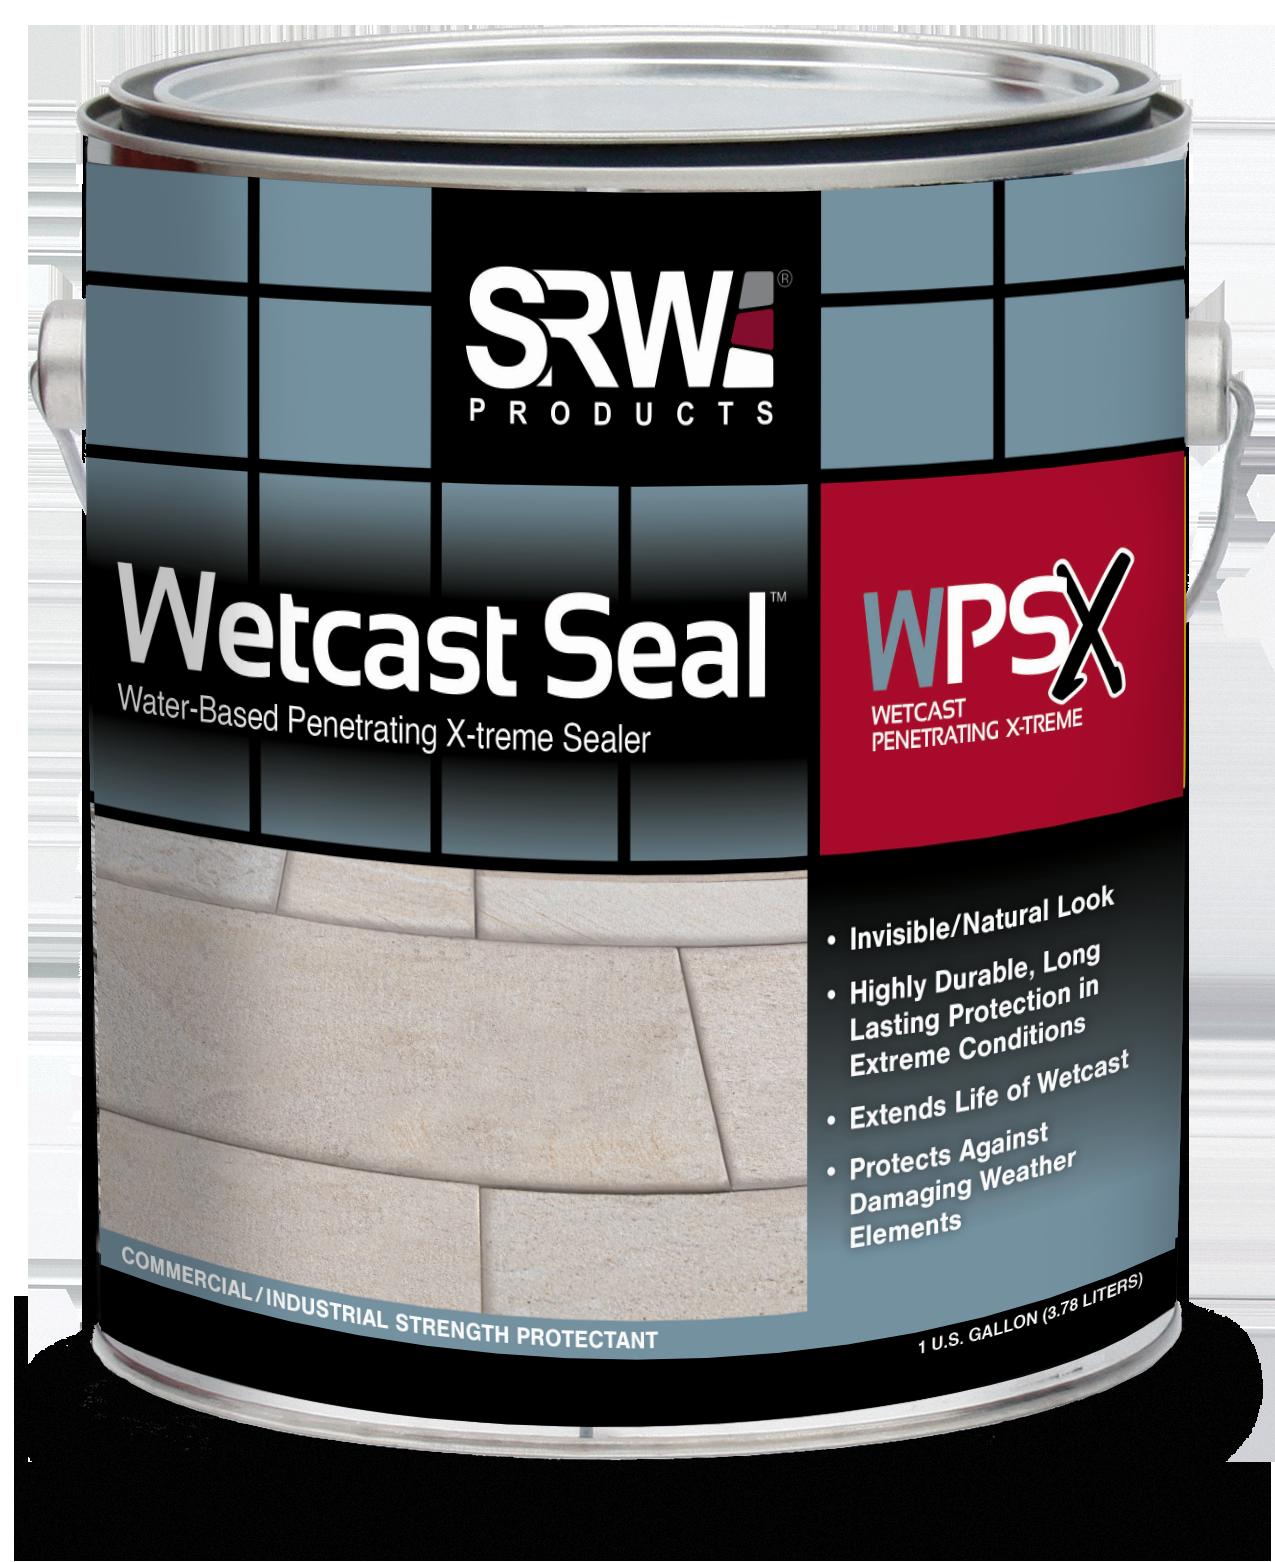 W-PSX_1Gallon_Wetcast Seal_2019_CMYK_SHADOW